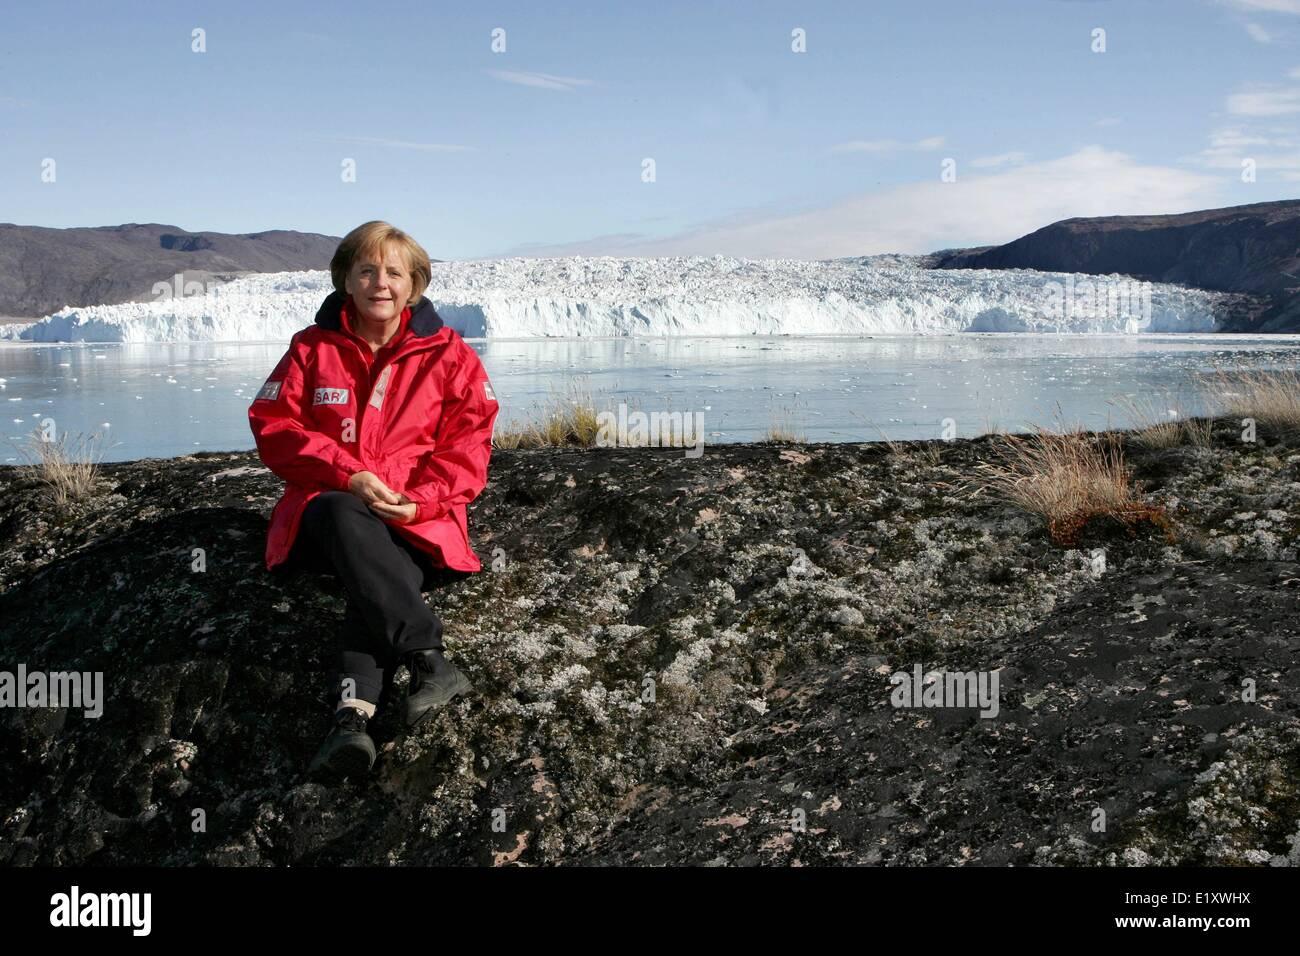 Chancellor Angela Merkel (CDU) sits at the Eqi glacier near Ilulissat in Greenland (17.08.2007). Foto: Michael KappelerStock Photo